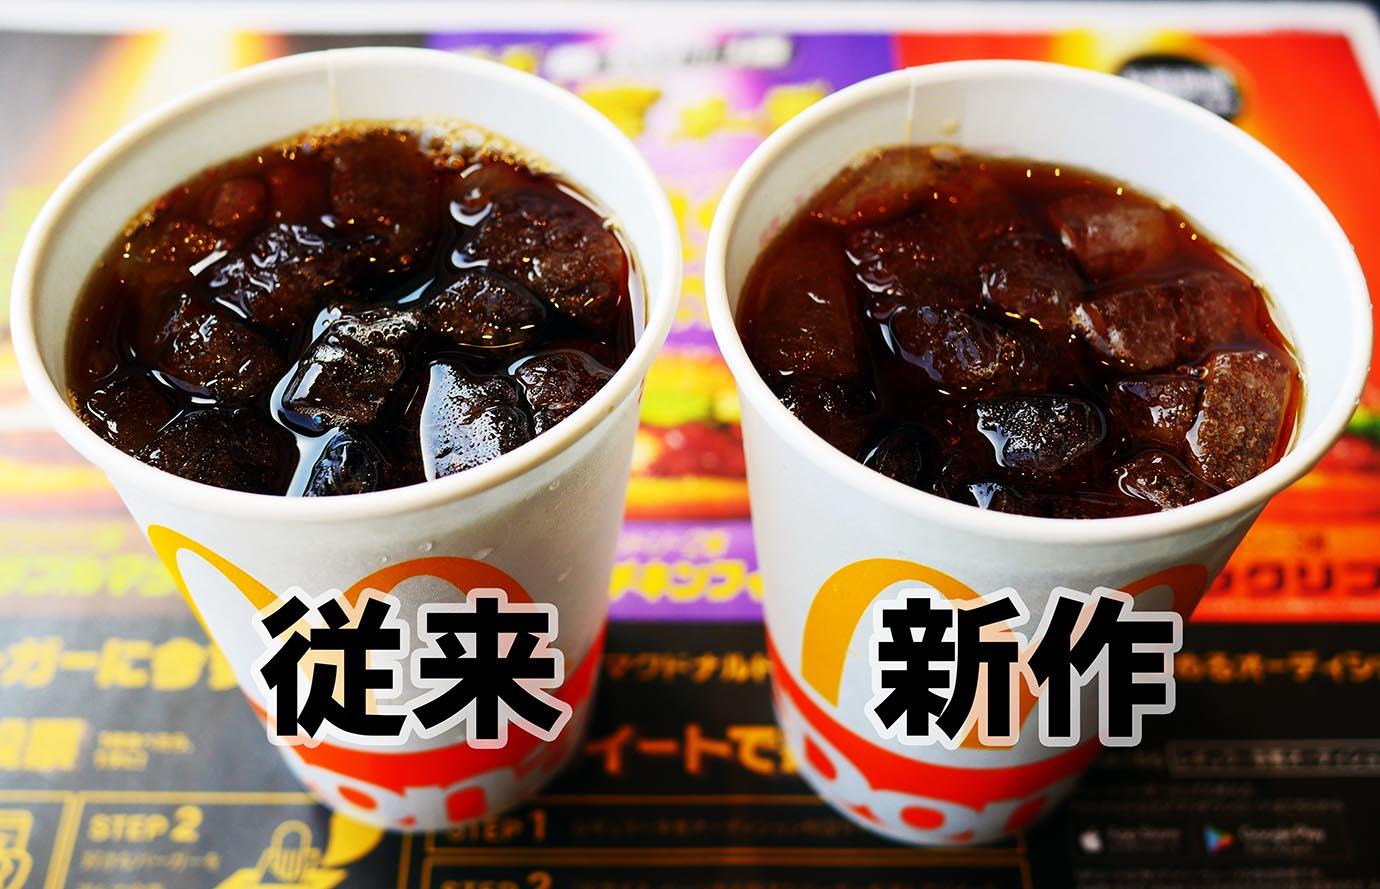 mcdonalds-new-iced-coffee6